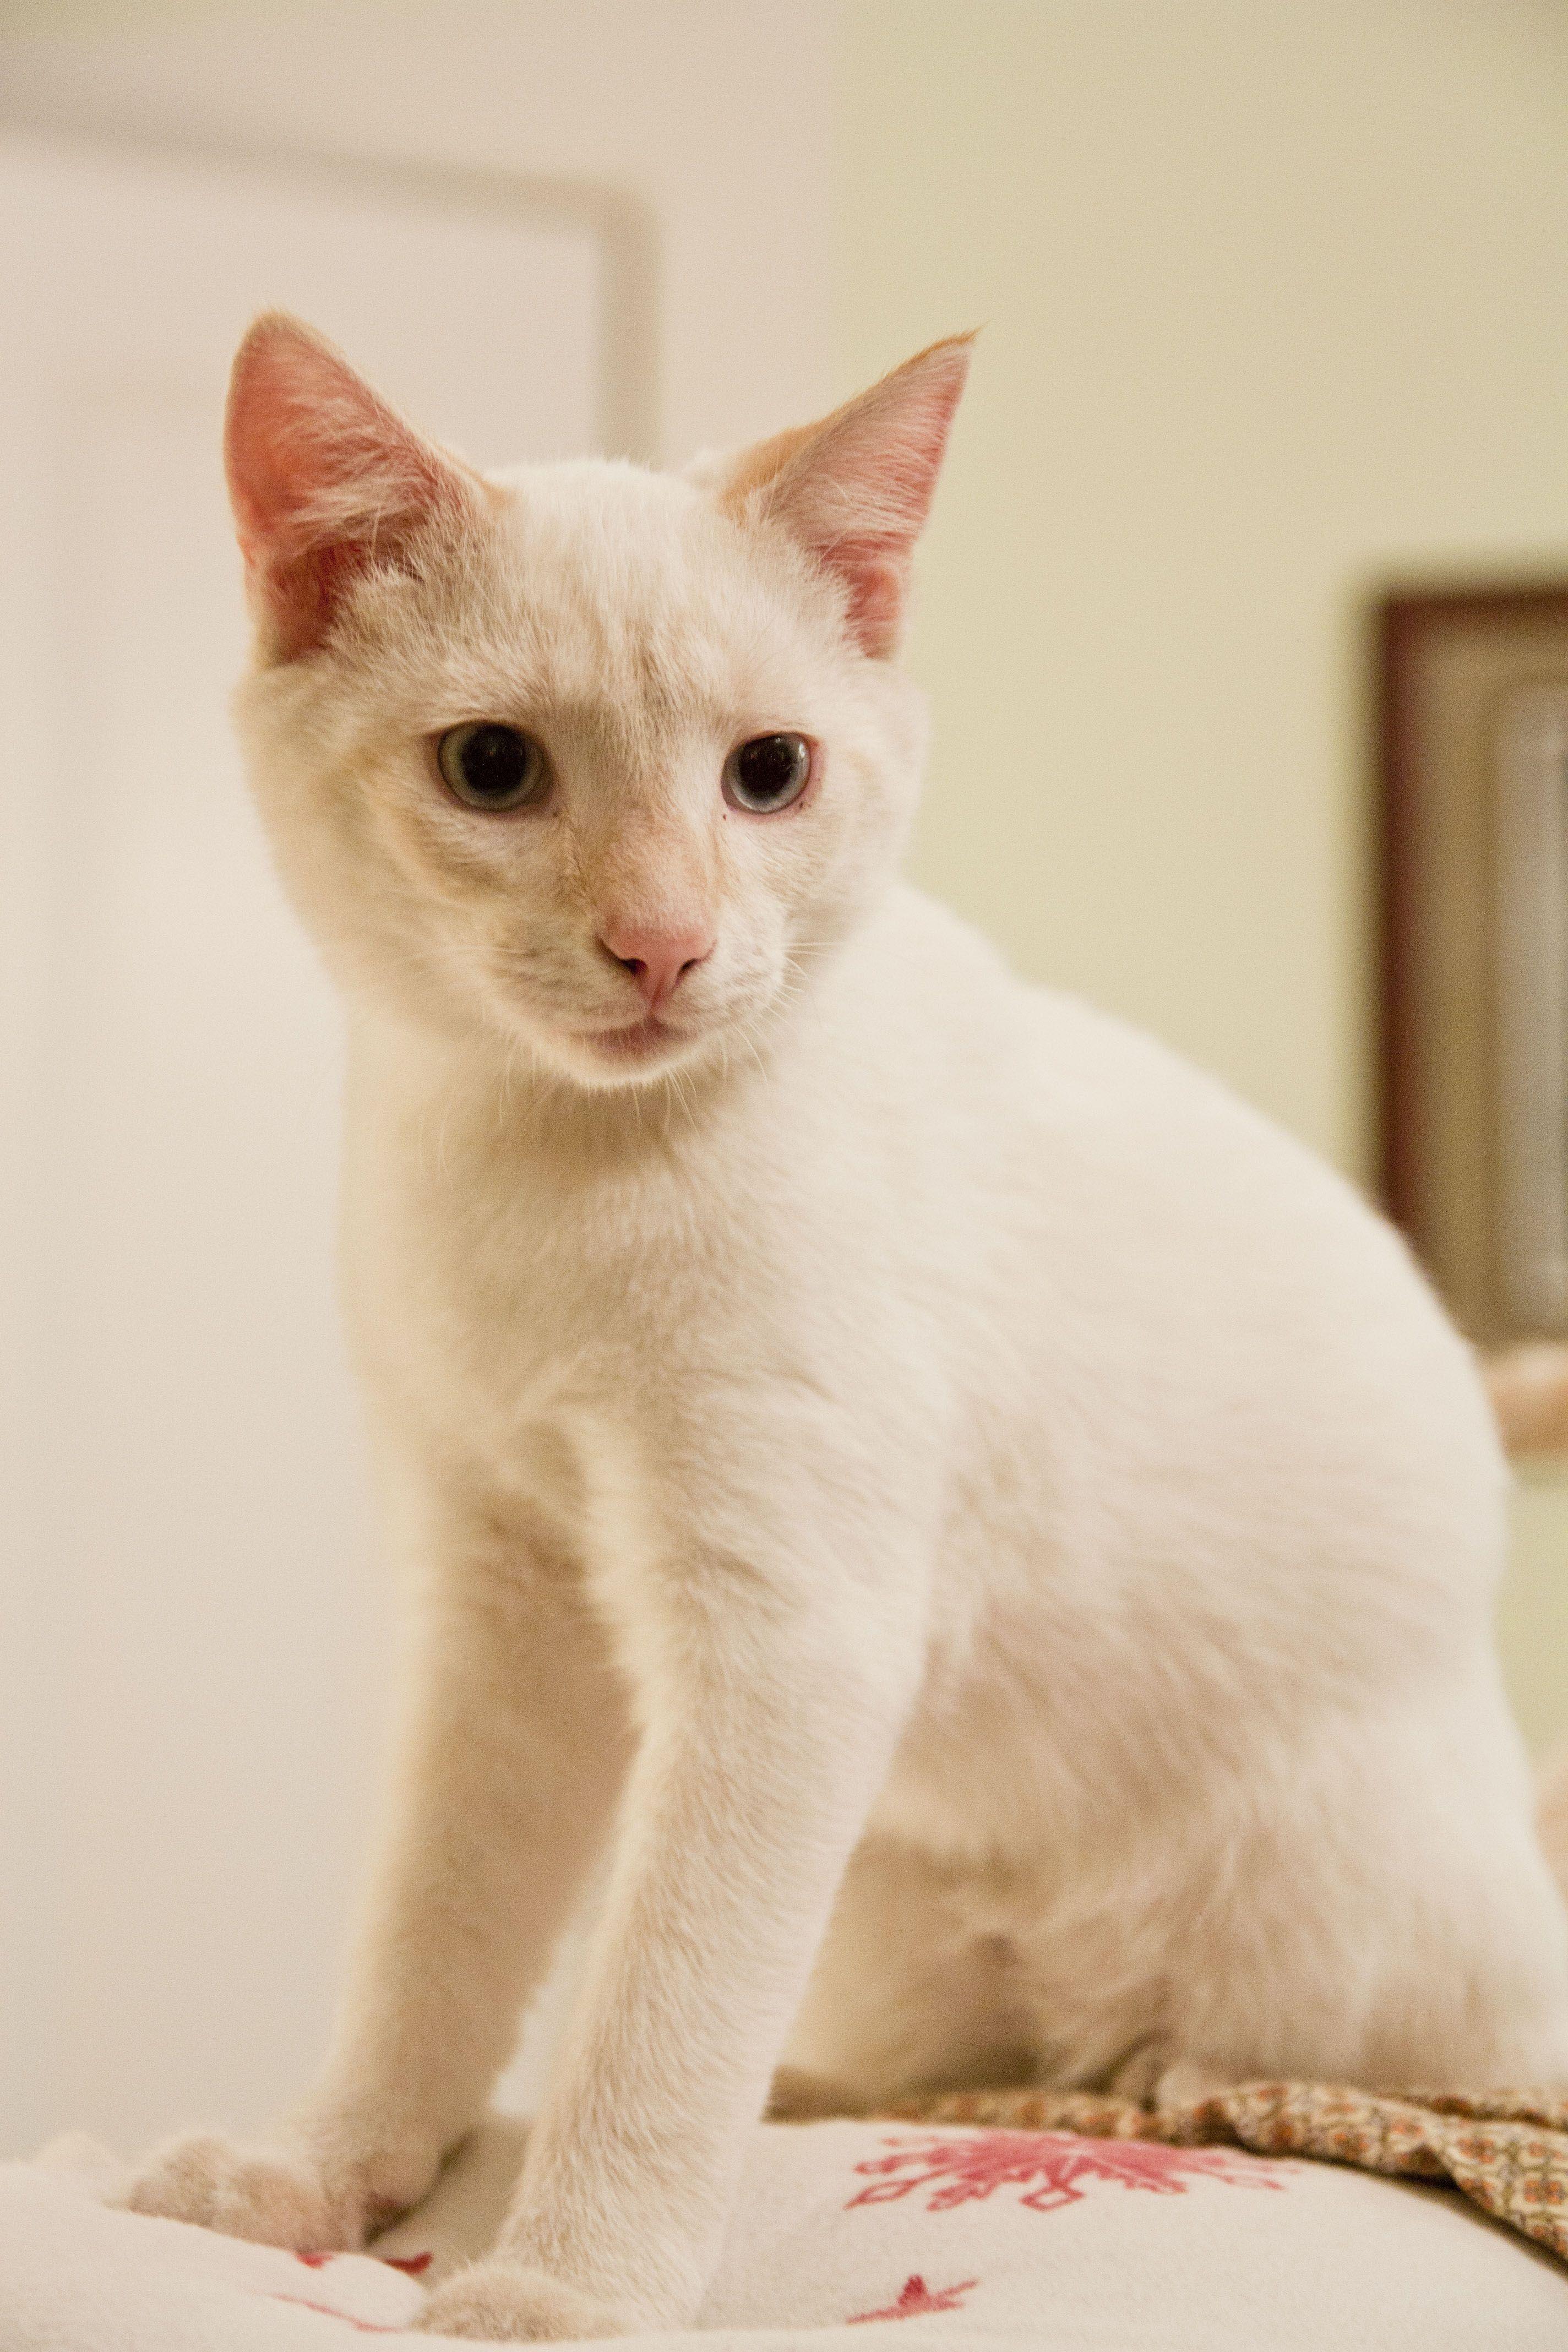 10 Cream Colored Cat Names Cream Colored Gemstones Cream Colored Nail Designs Cream Colored Pumps Cream Colored Window V Cat Coloring Page Cats Cat Colors